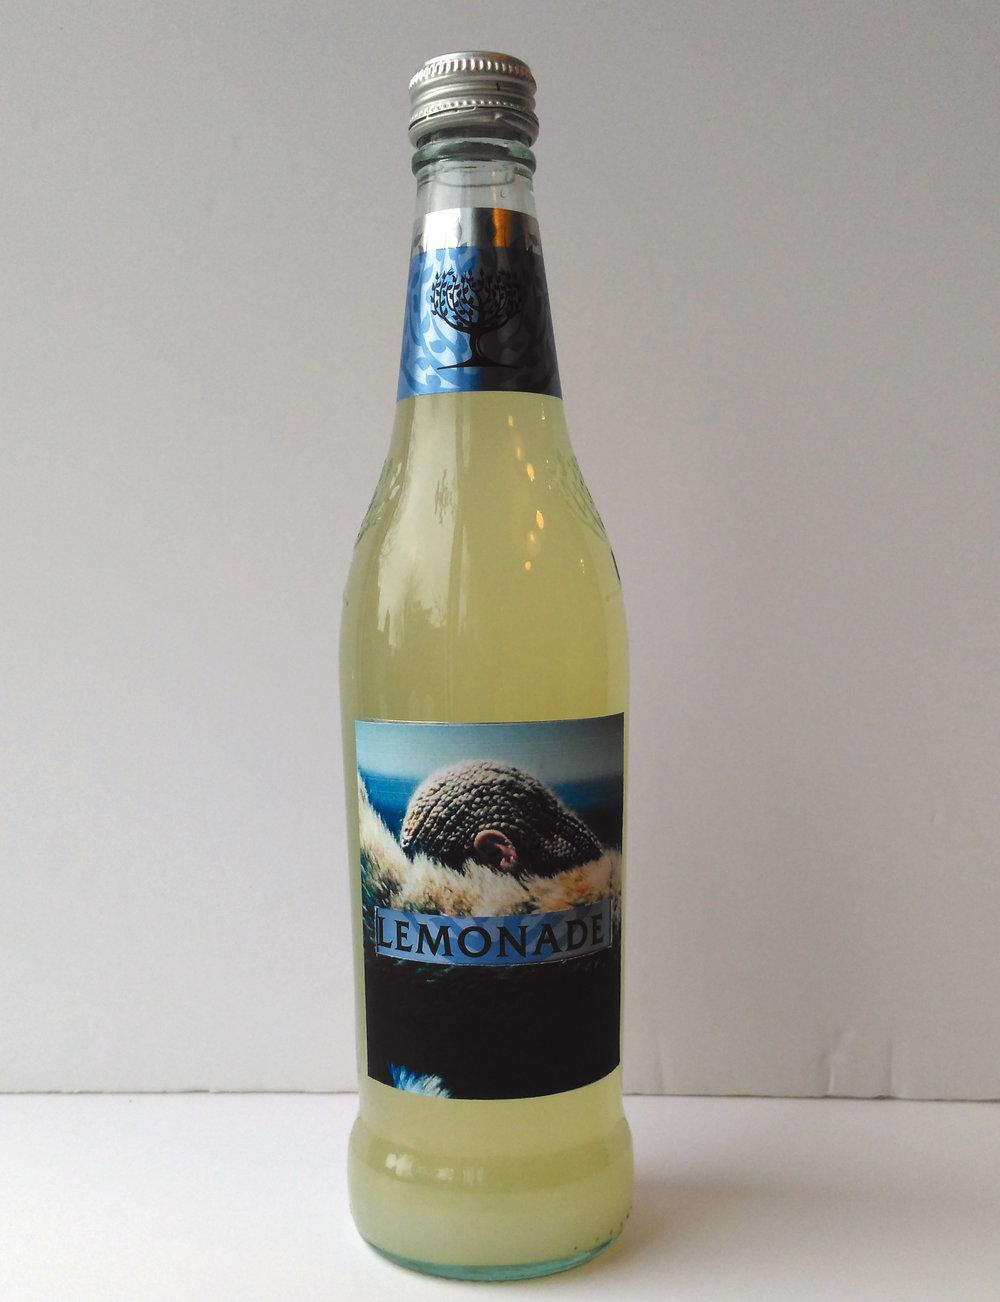 15. Lemonade